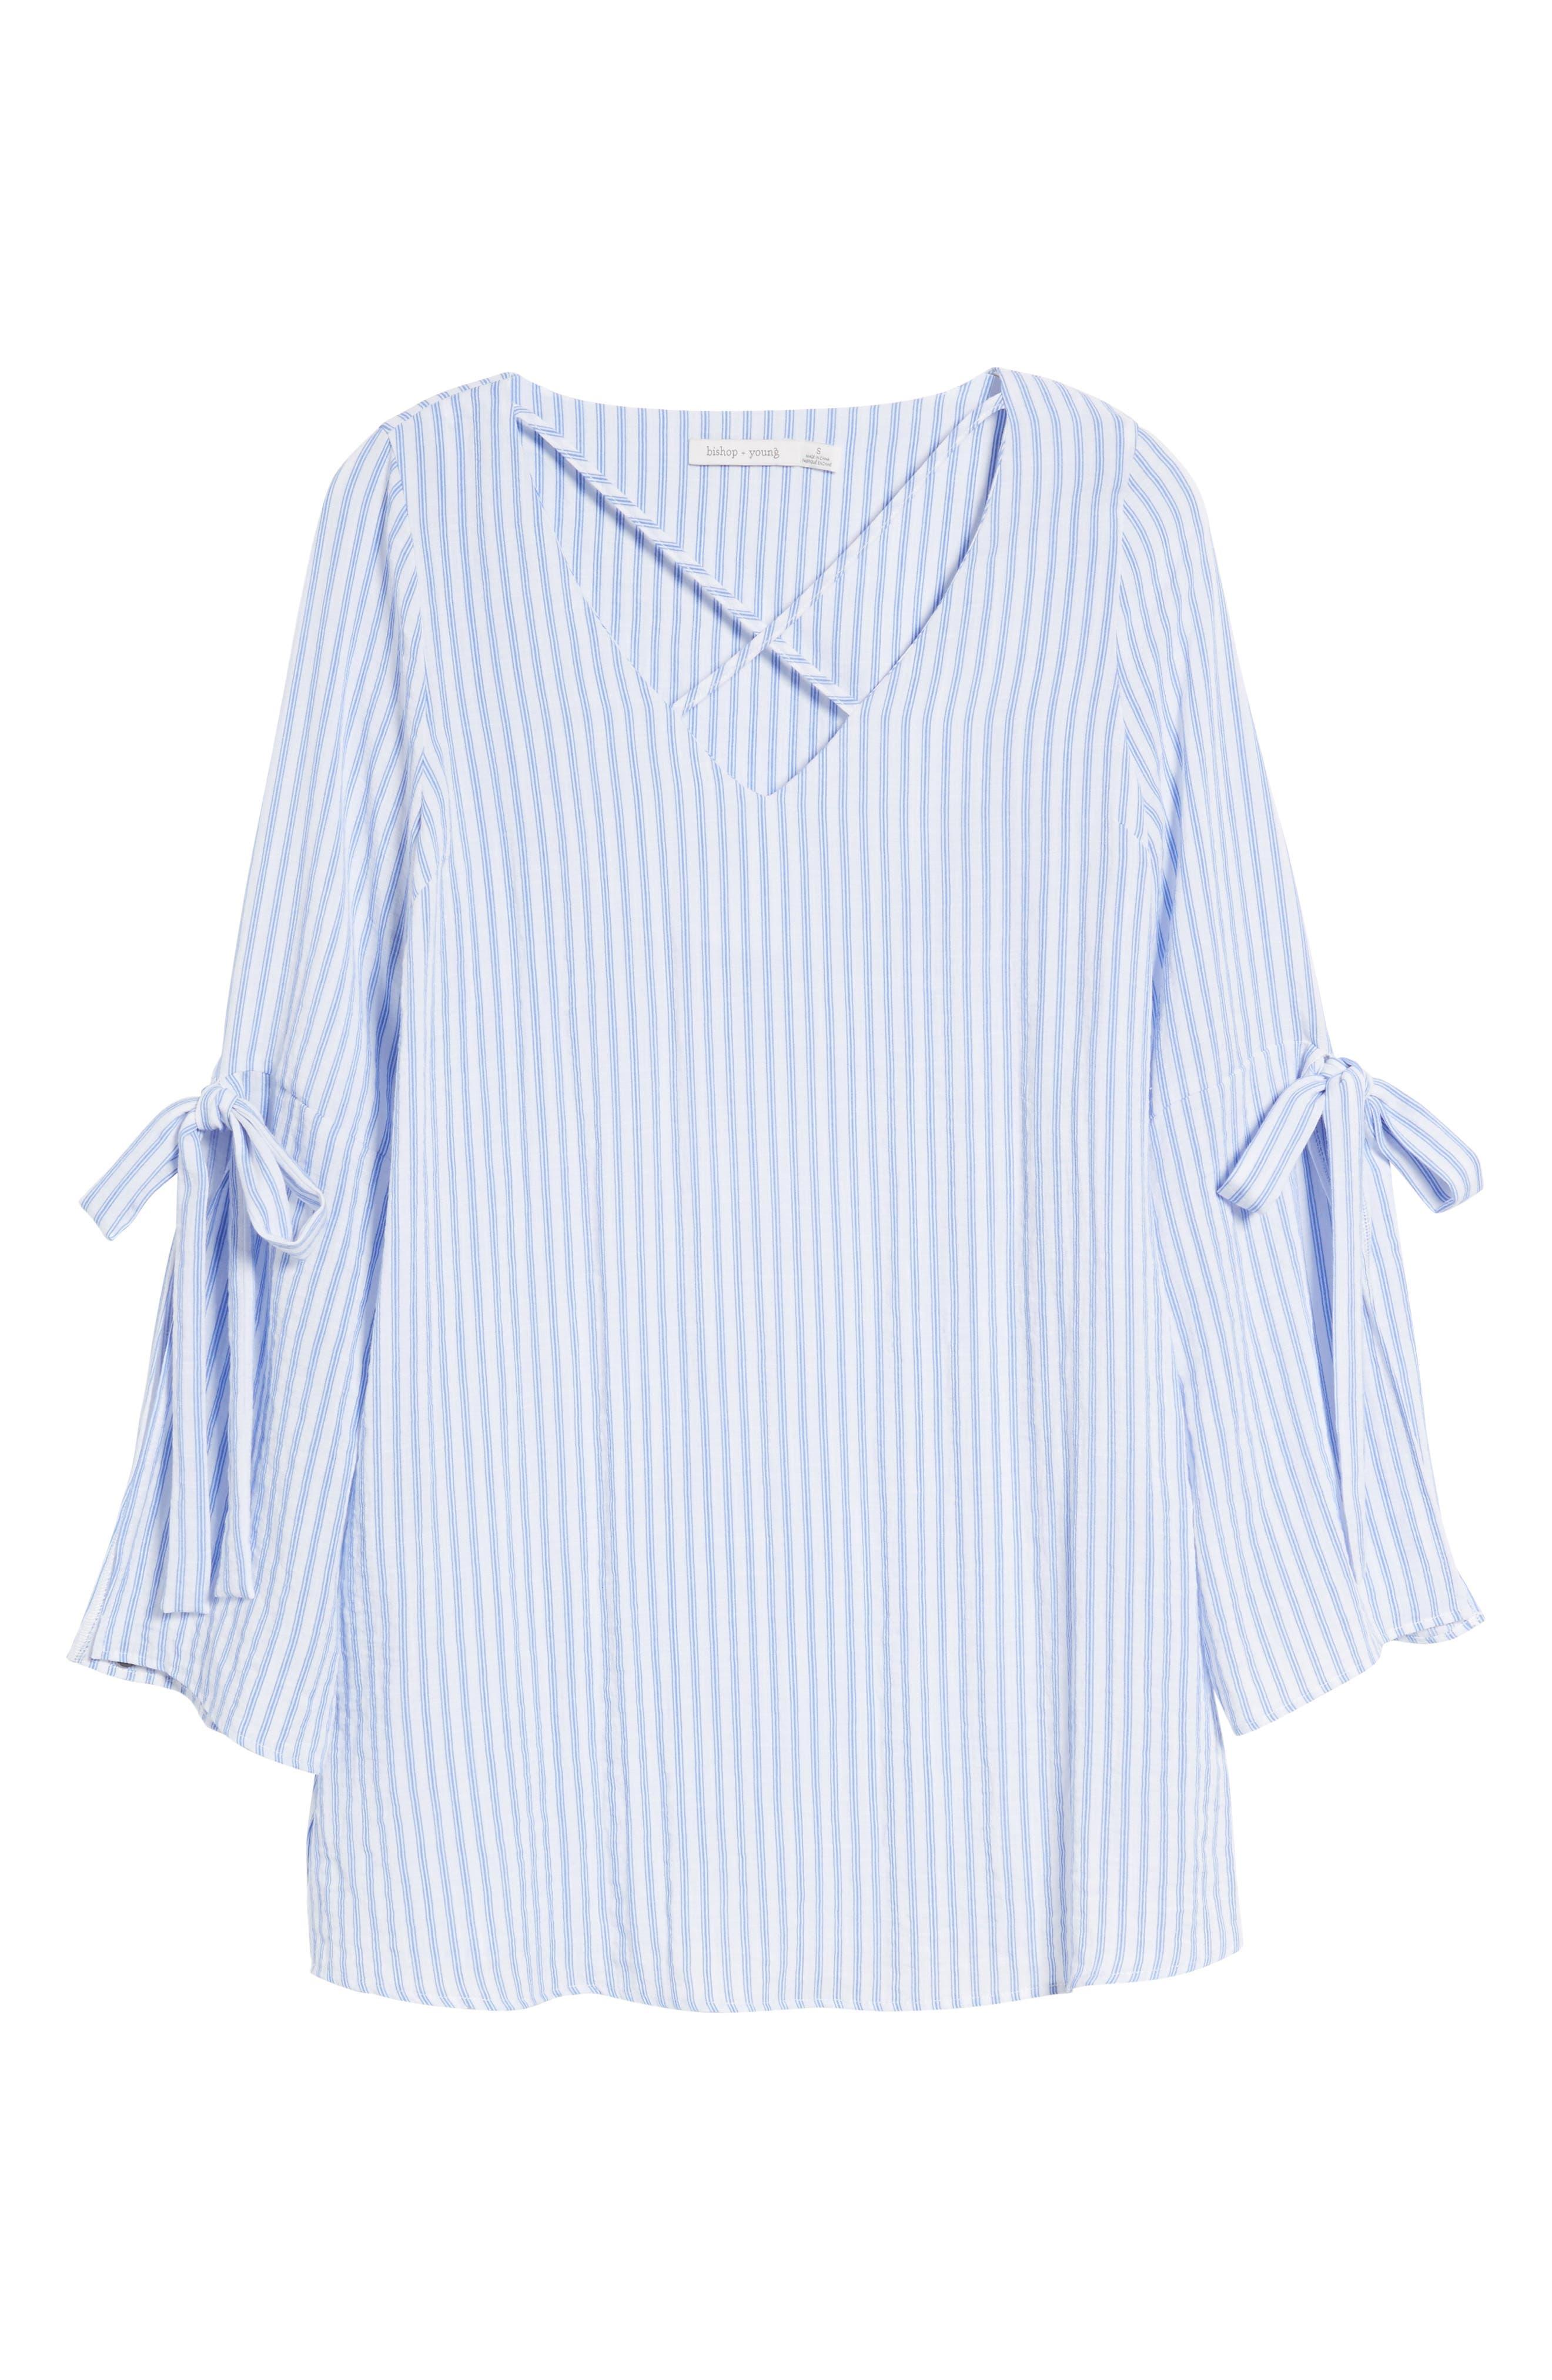 Bishop + Young Stripe Tunic Top,                             Alternate thumbnail 7, color,                             Blue White Stripe